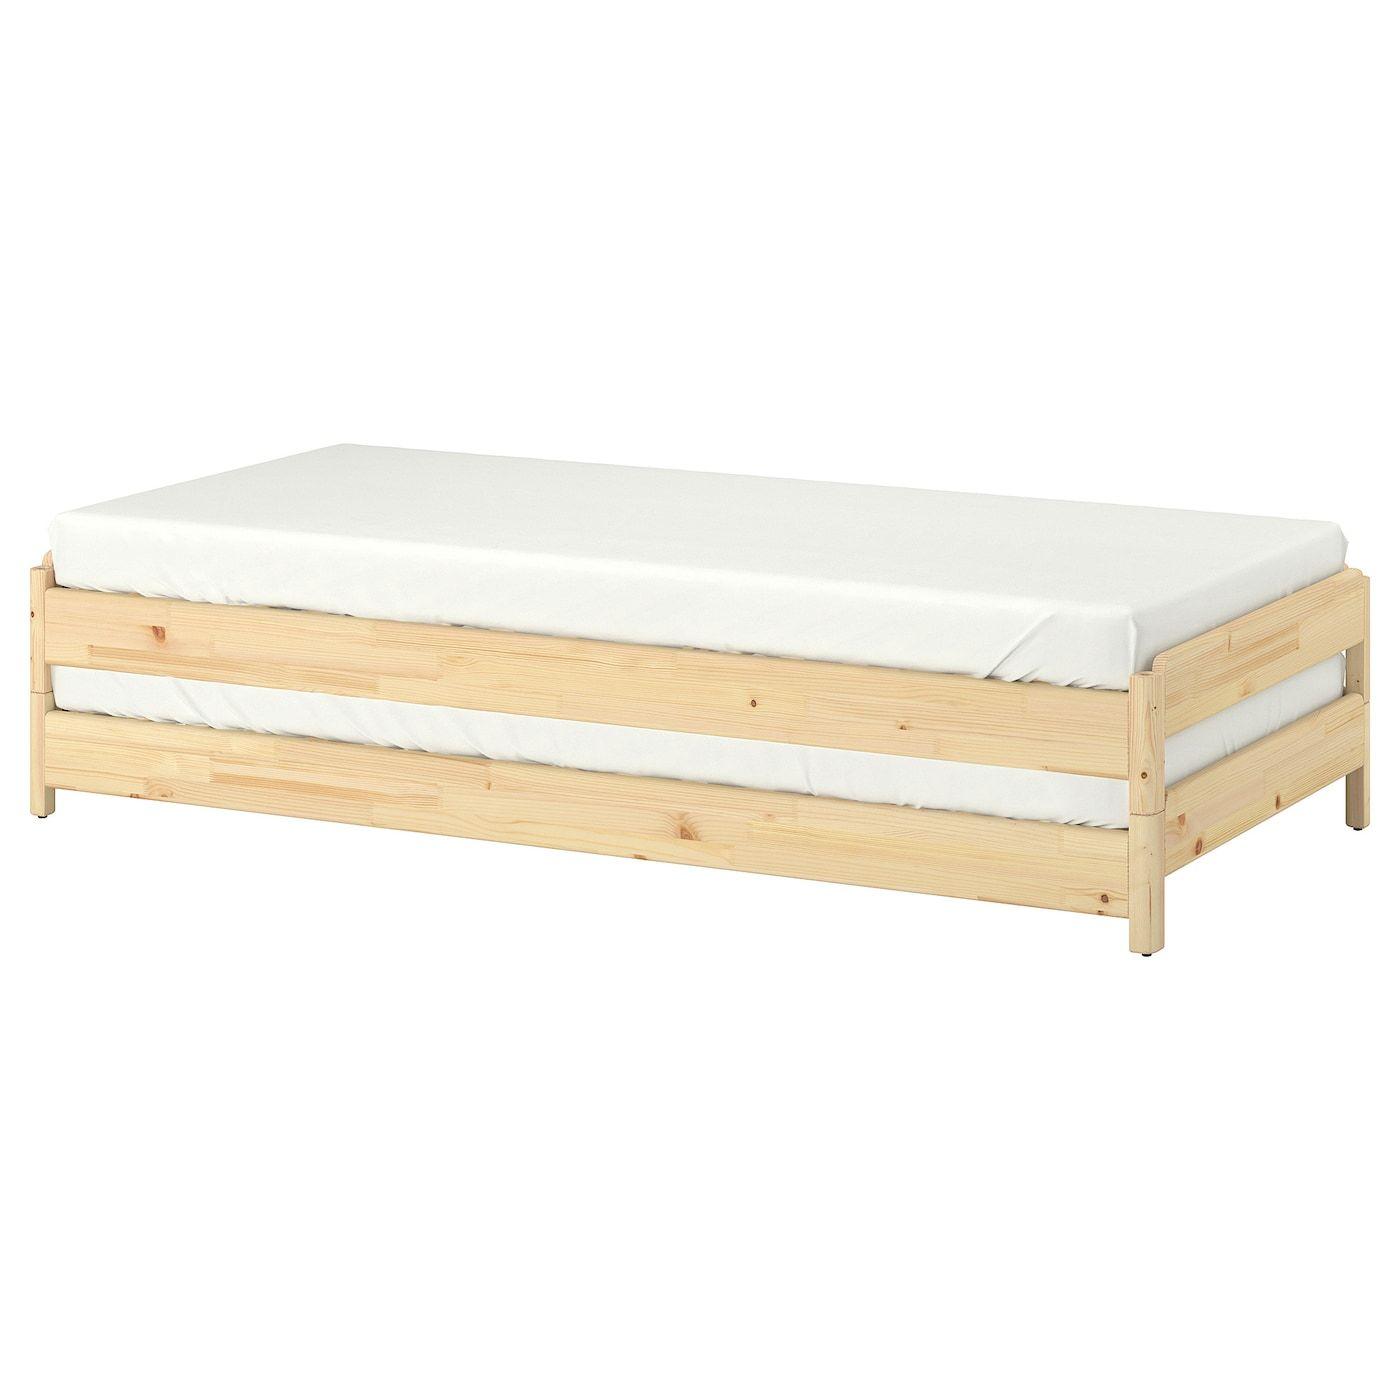 Utaker Stackable Bed Pine Twin Ikea Ikea Bed Bed Slats